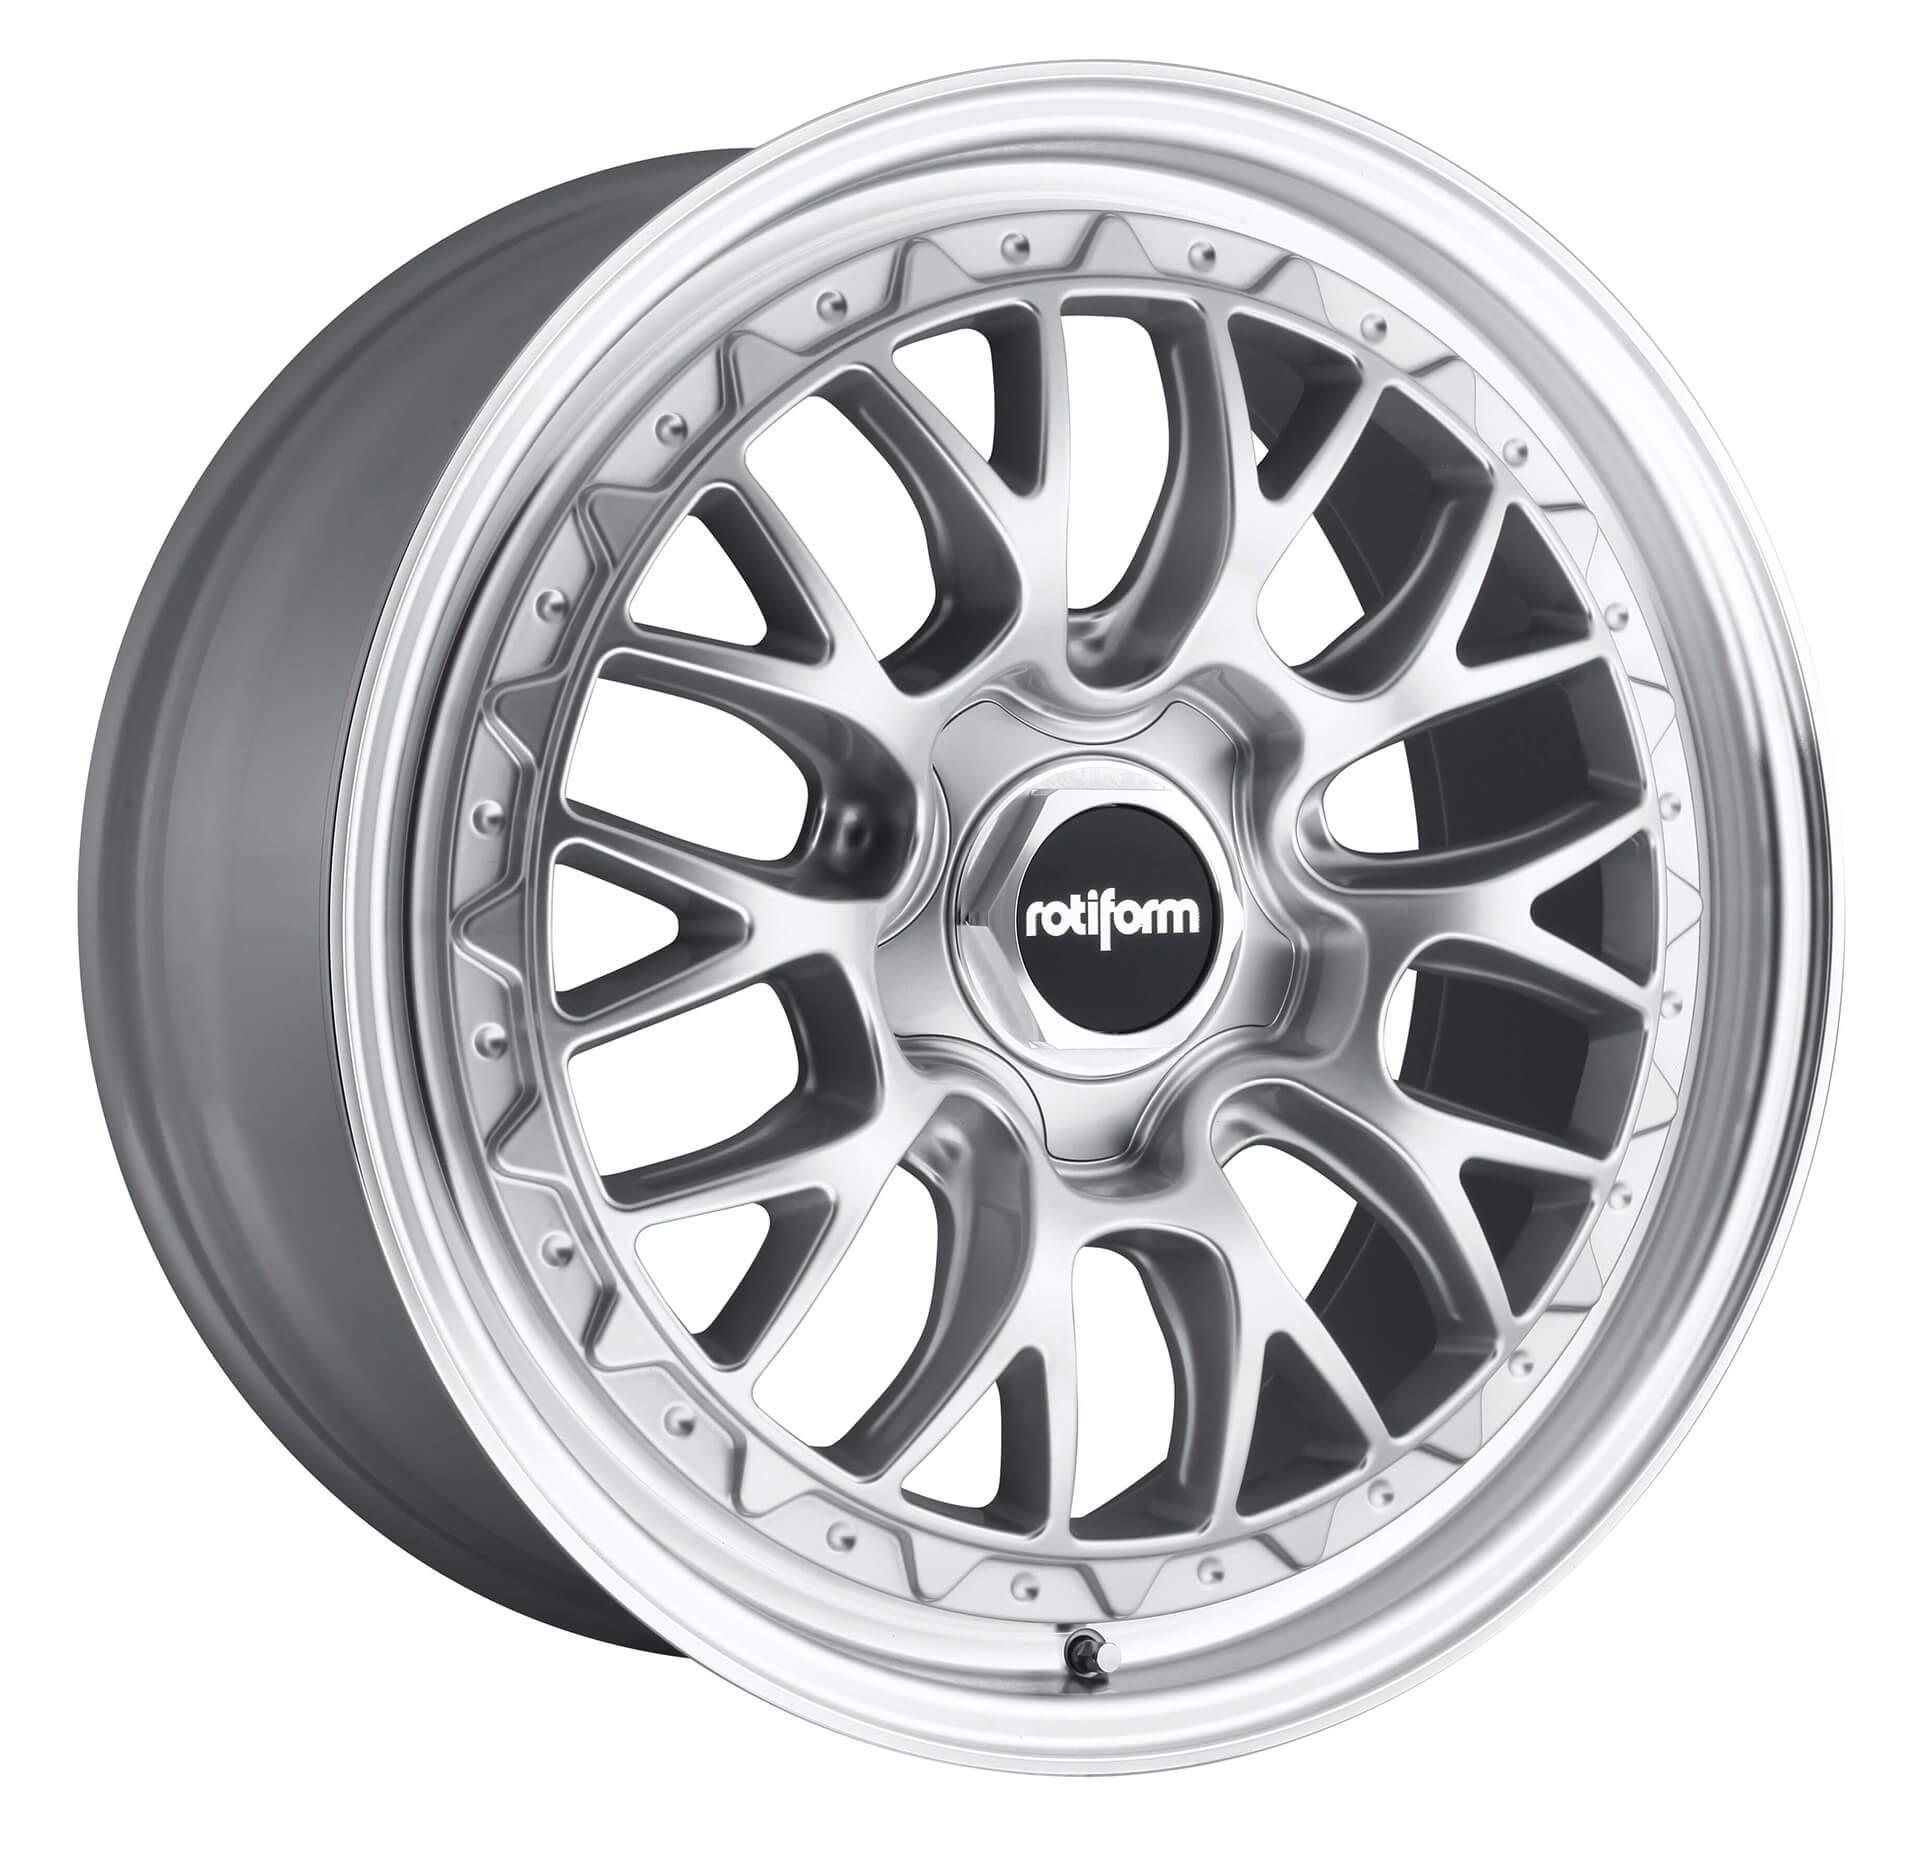 Rotiform Cast Wheel - LSR Cast 1 Piece